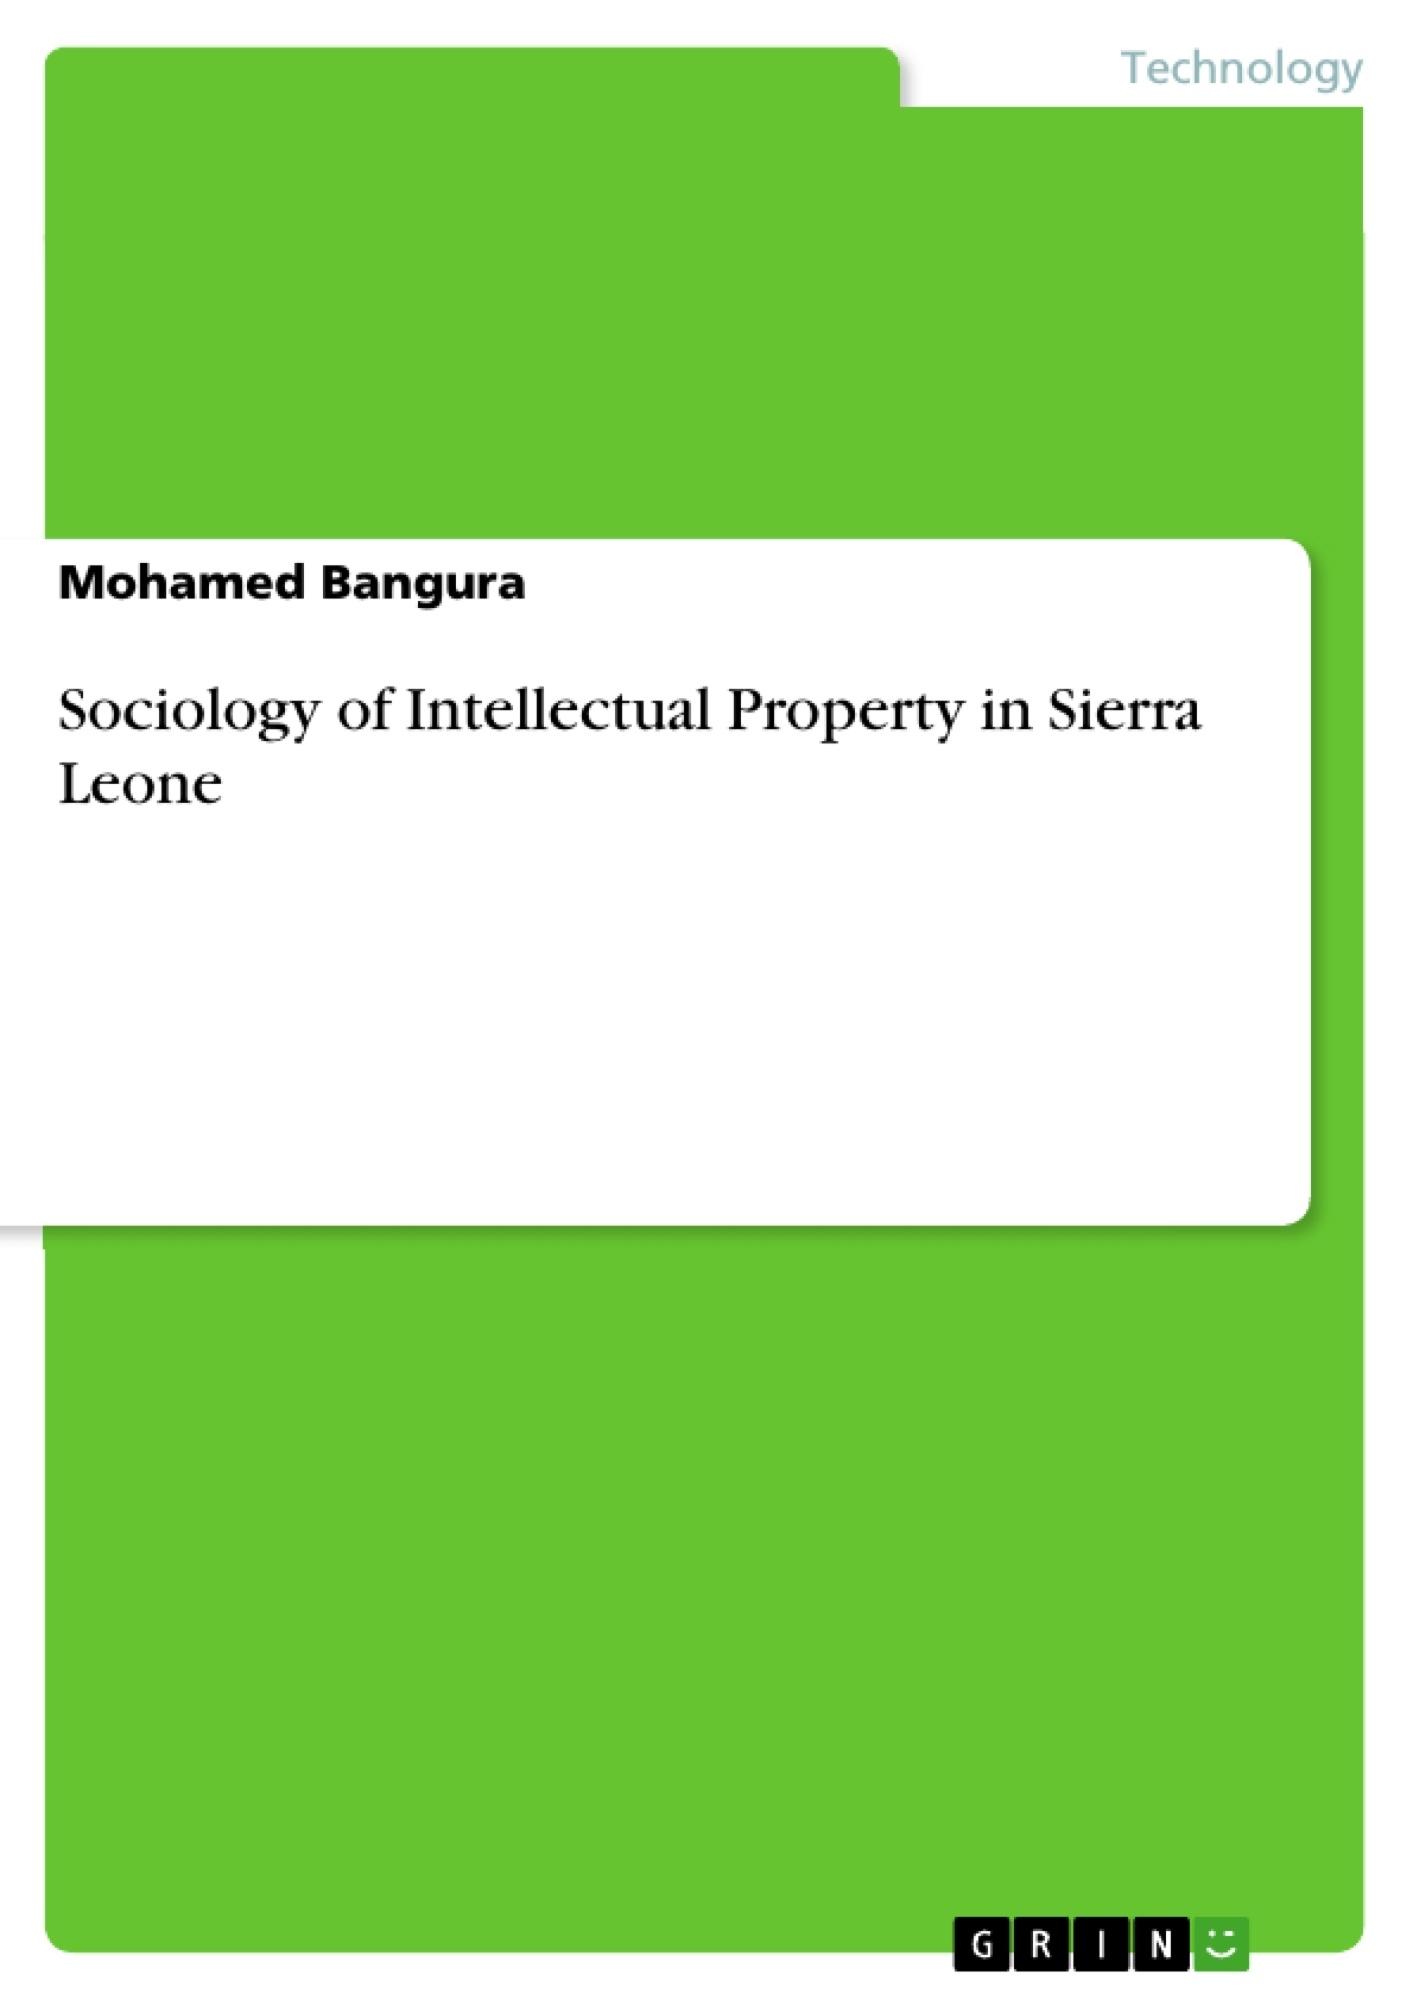 Title: Sociology of Intellectual Property in Sierra Leone